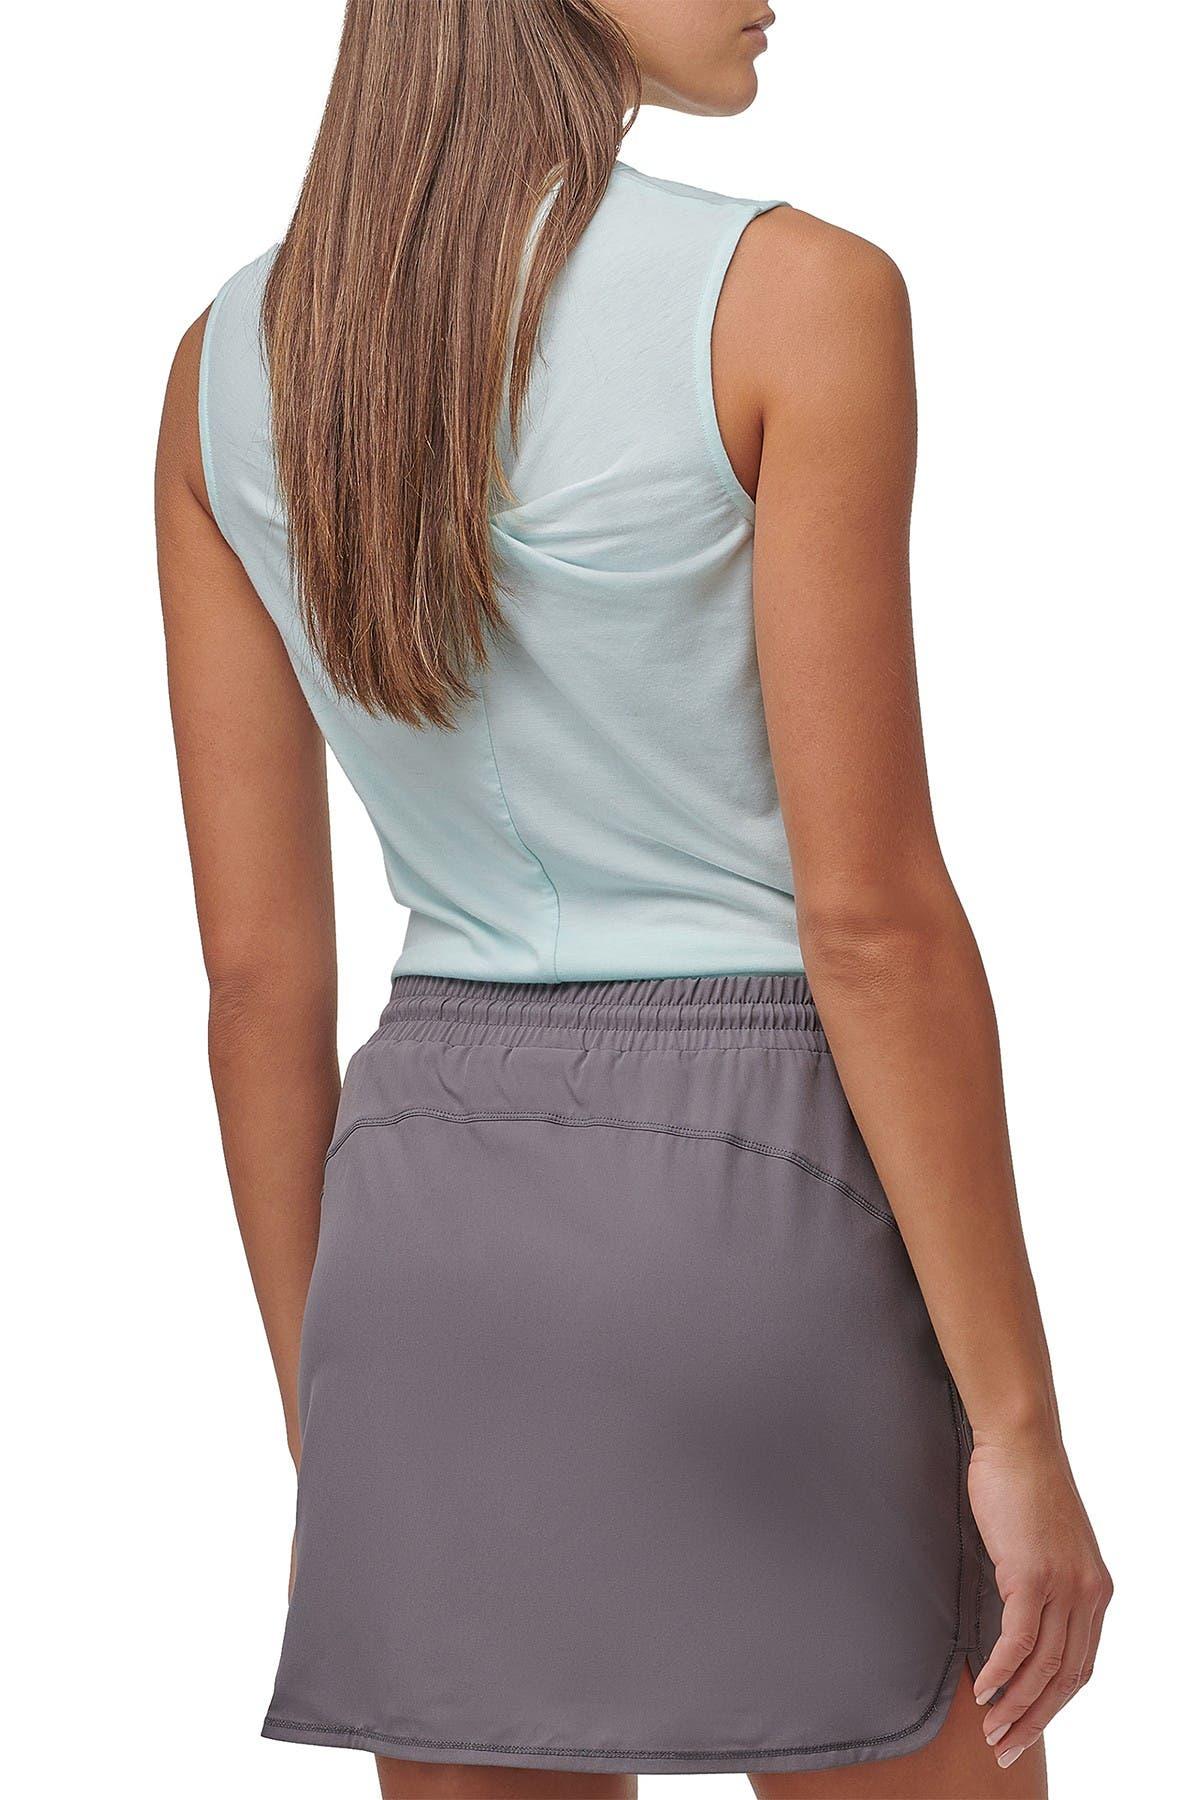 Marc New York Performance Womens Pinstripe Denim Jersey High-Low Top Shirt